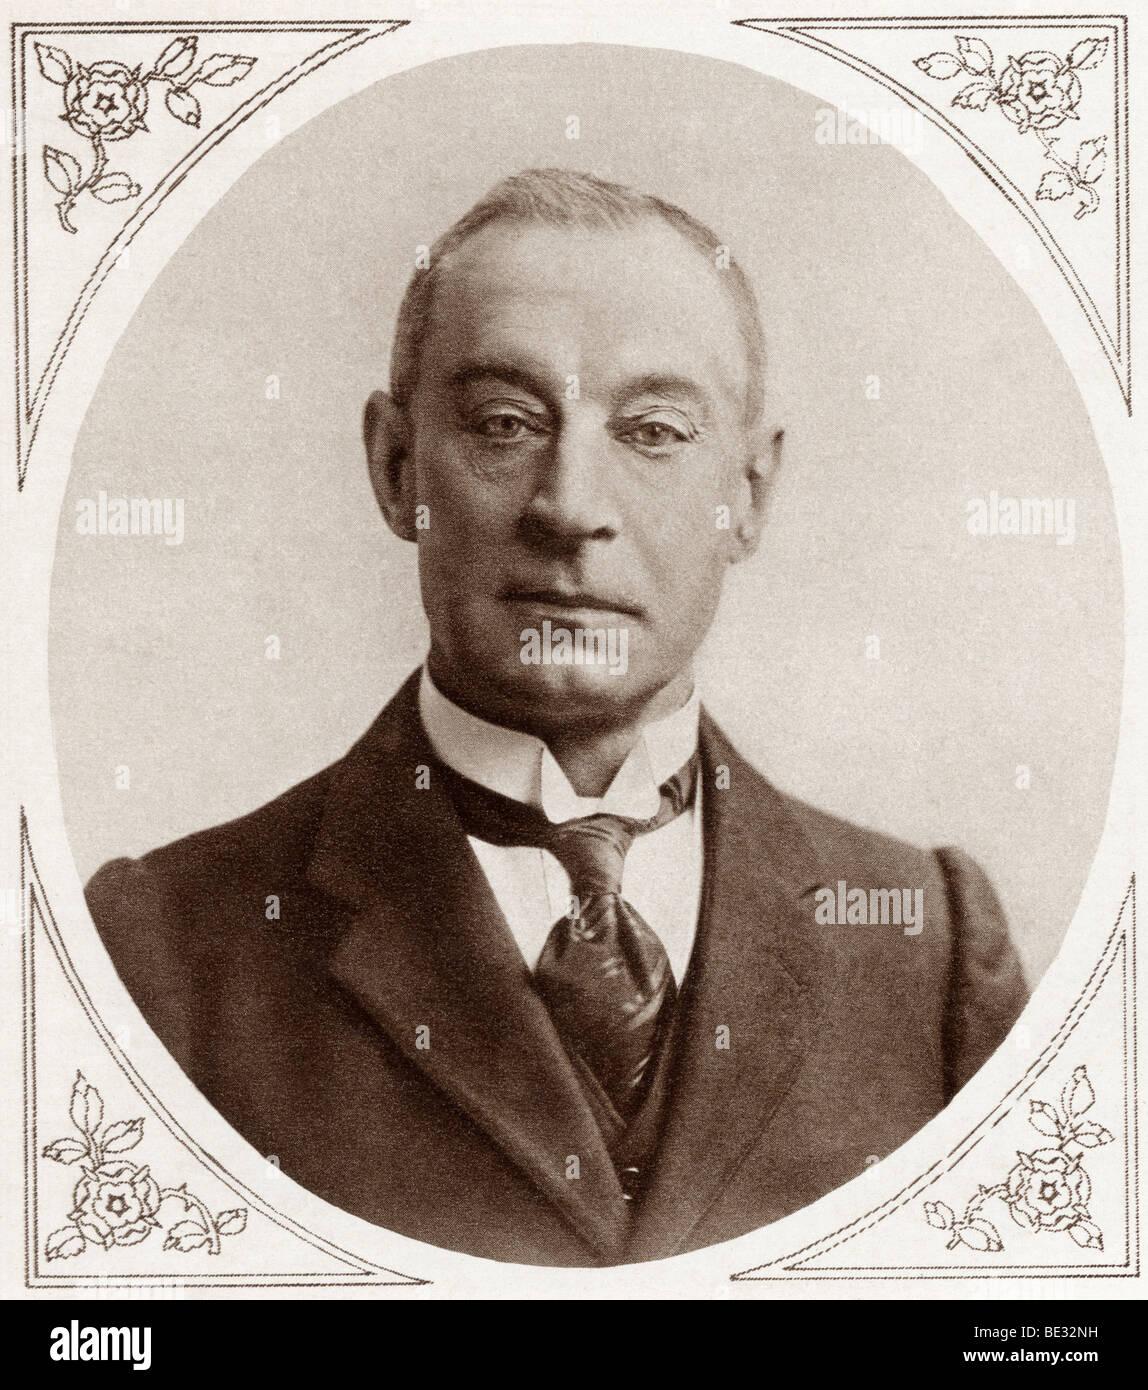 Sir Henry Bradwardine Jackson, 1855 to 1929. Admiral in the British Navy. - Stock Image